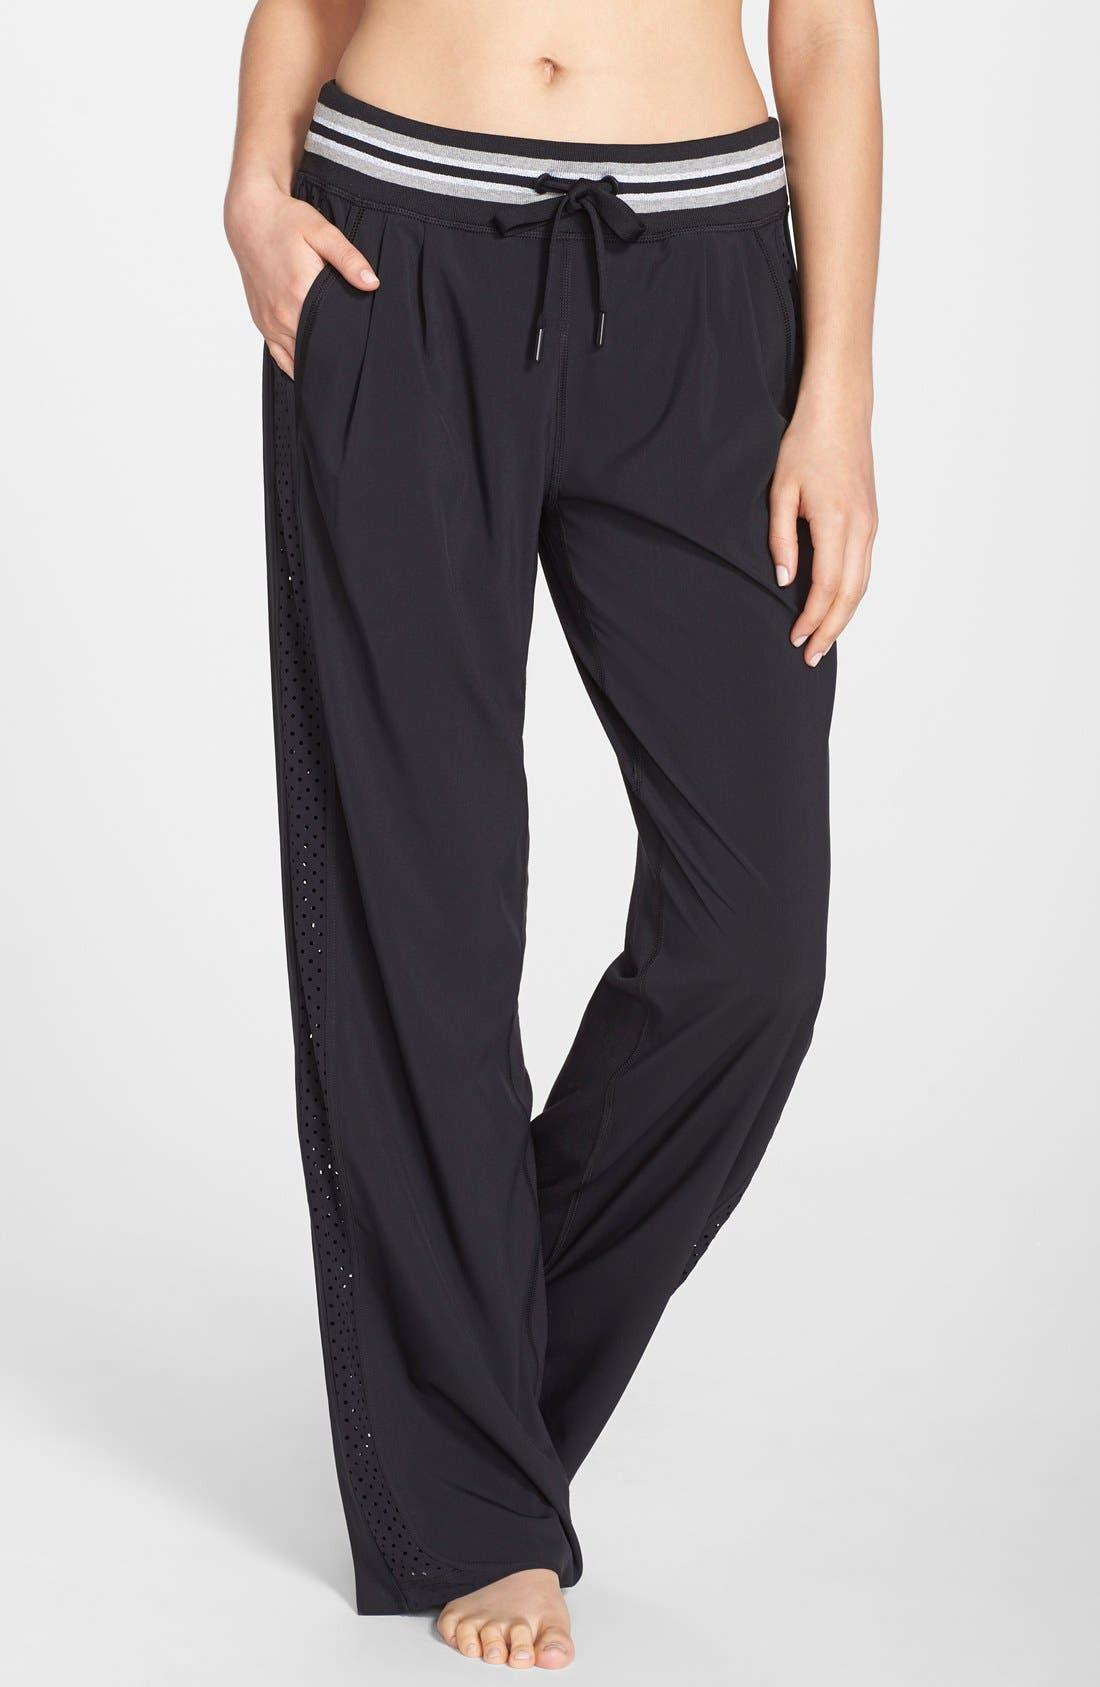 Main Image - Zella Side Zip Track Pants